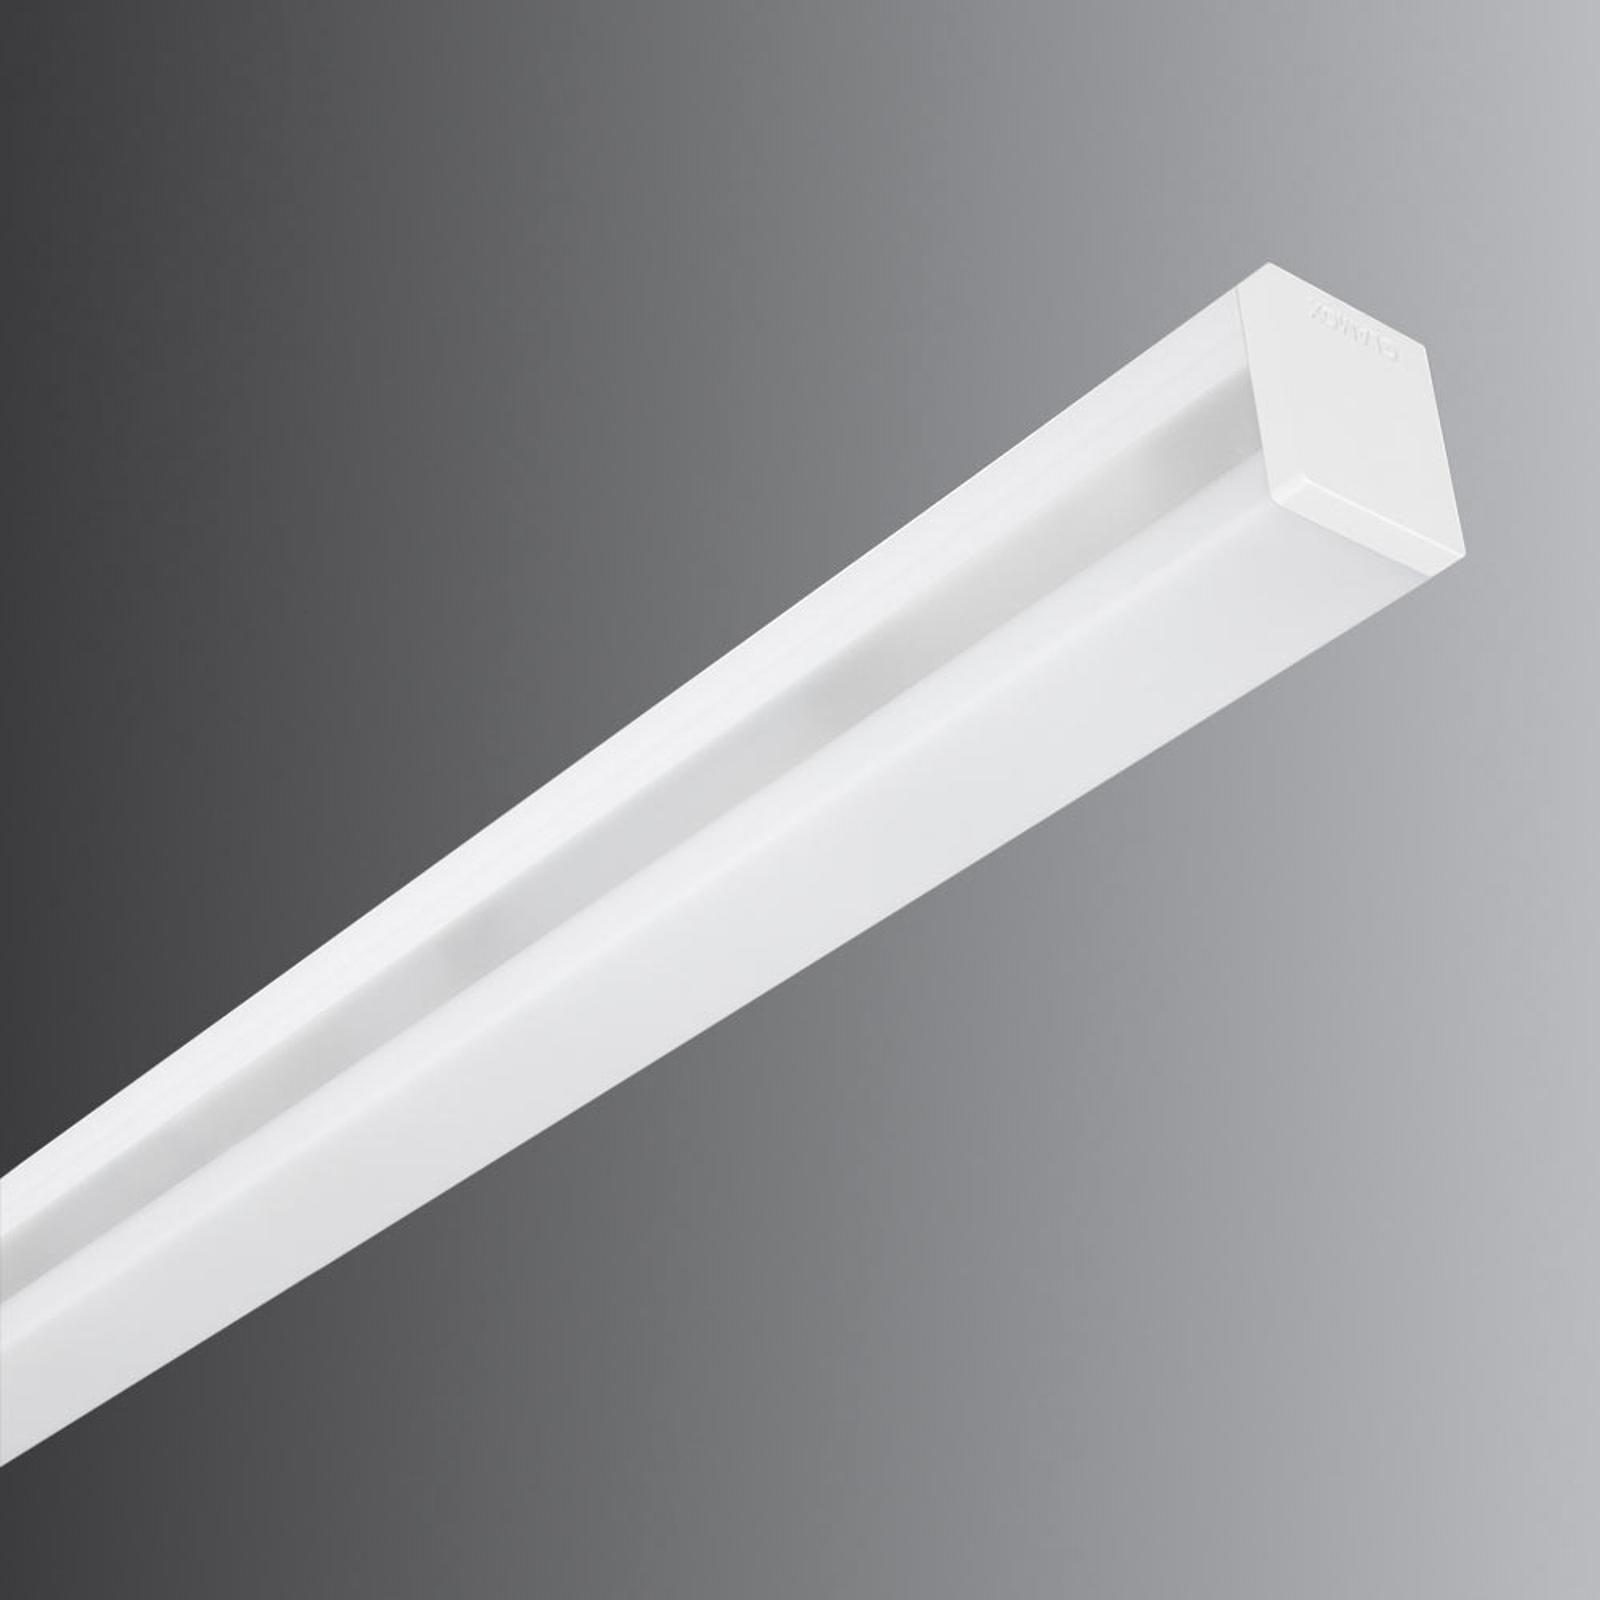 16 W LED speillampe A40-W1200 2100HF 120 cm 4000